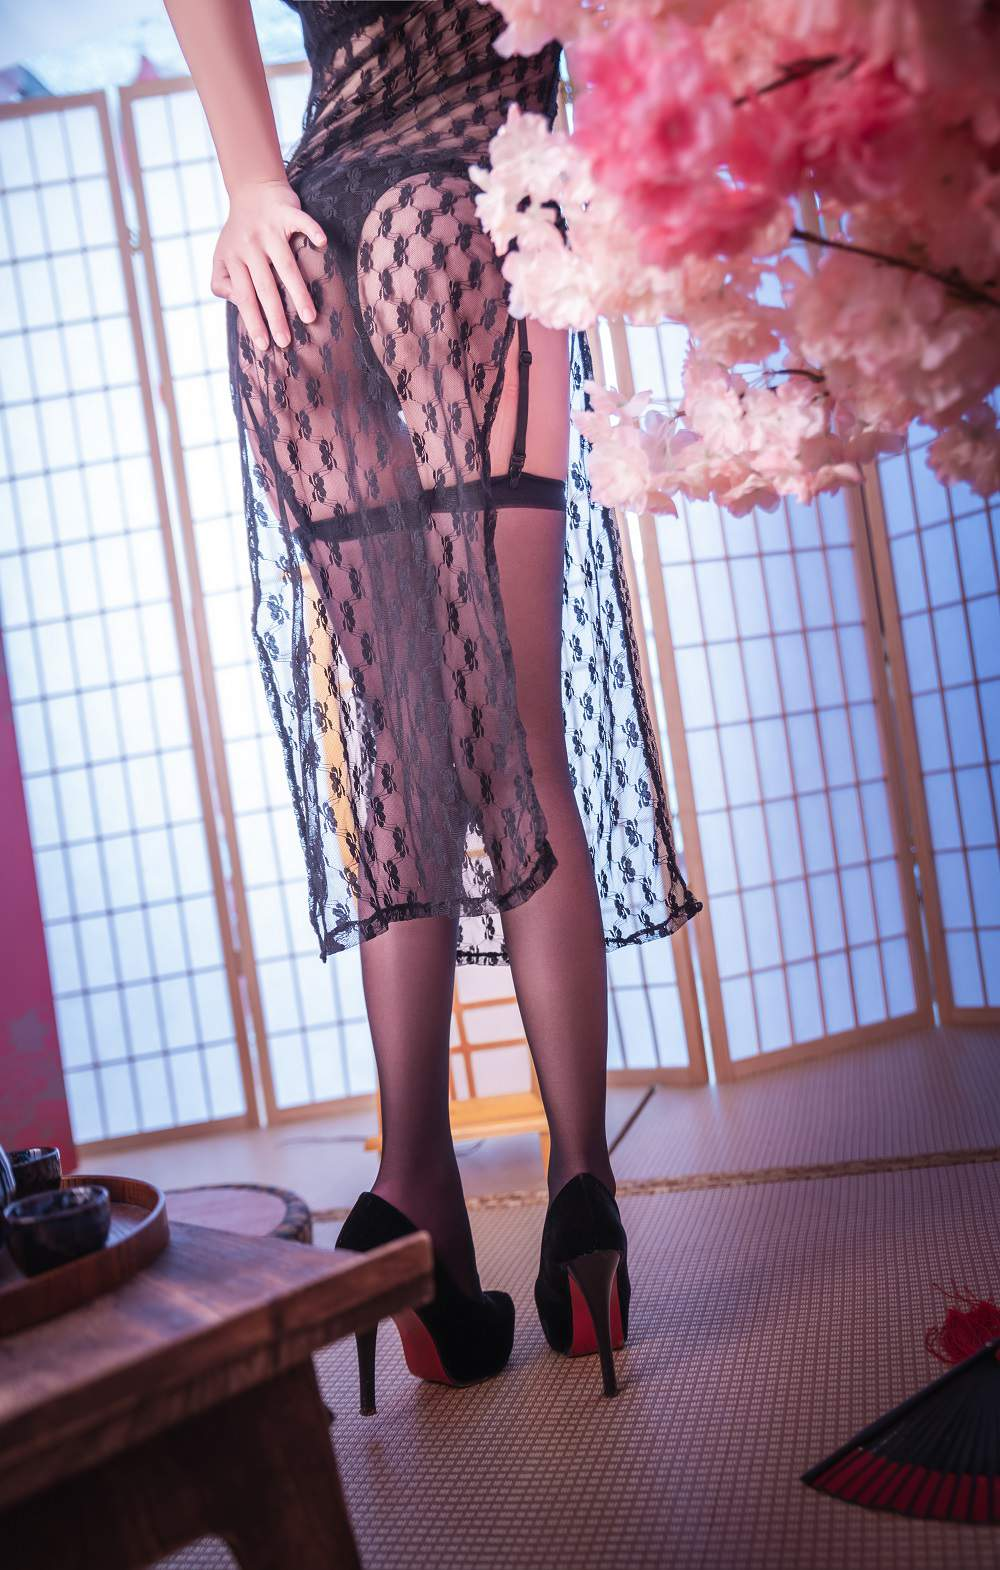 【Cosplay】面饼仙儿 - 黑丝情趣旗袍 COS-第3张